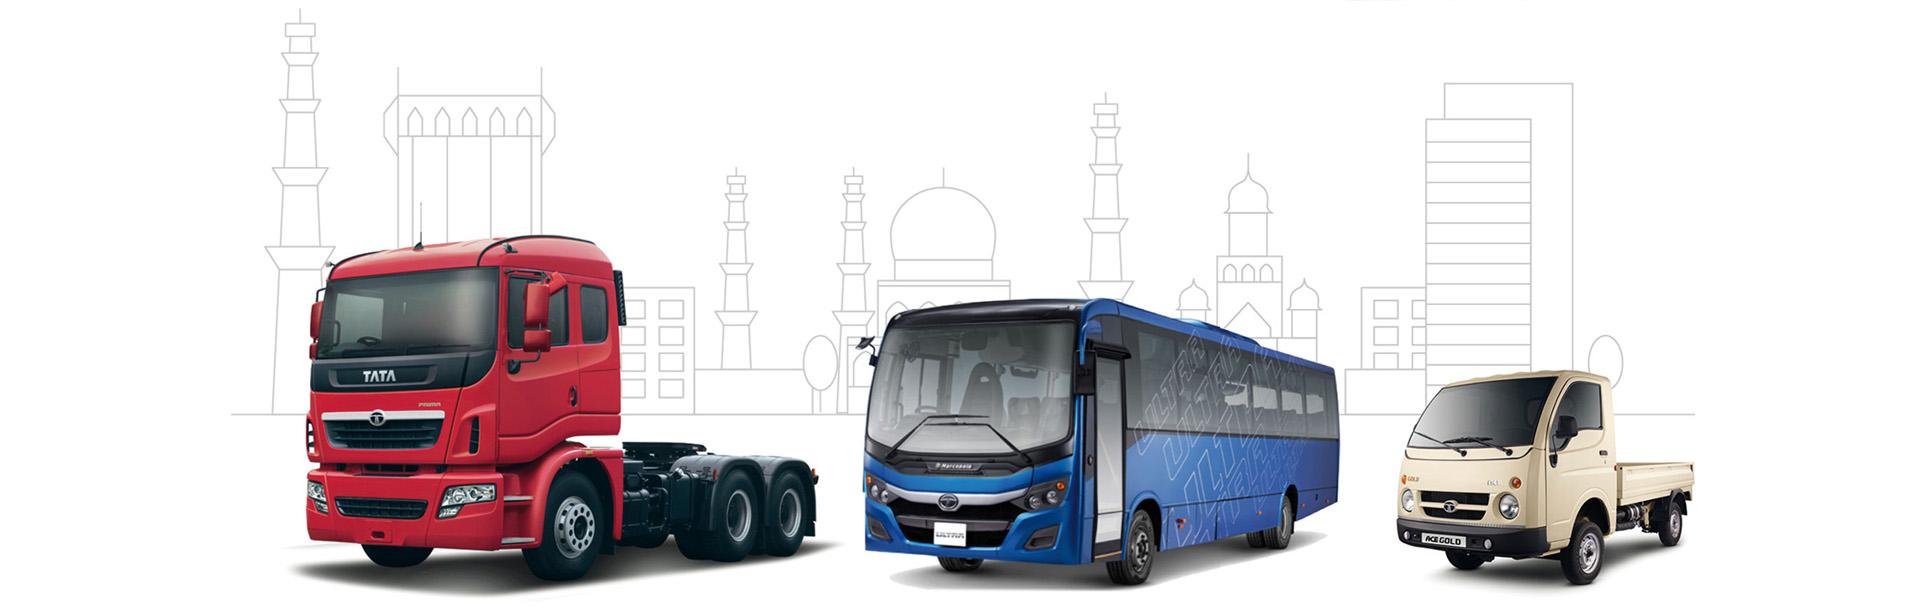 Tata bus and trucks